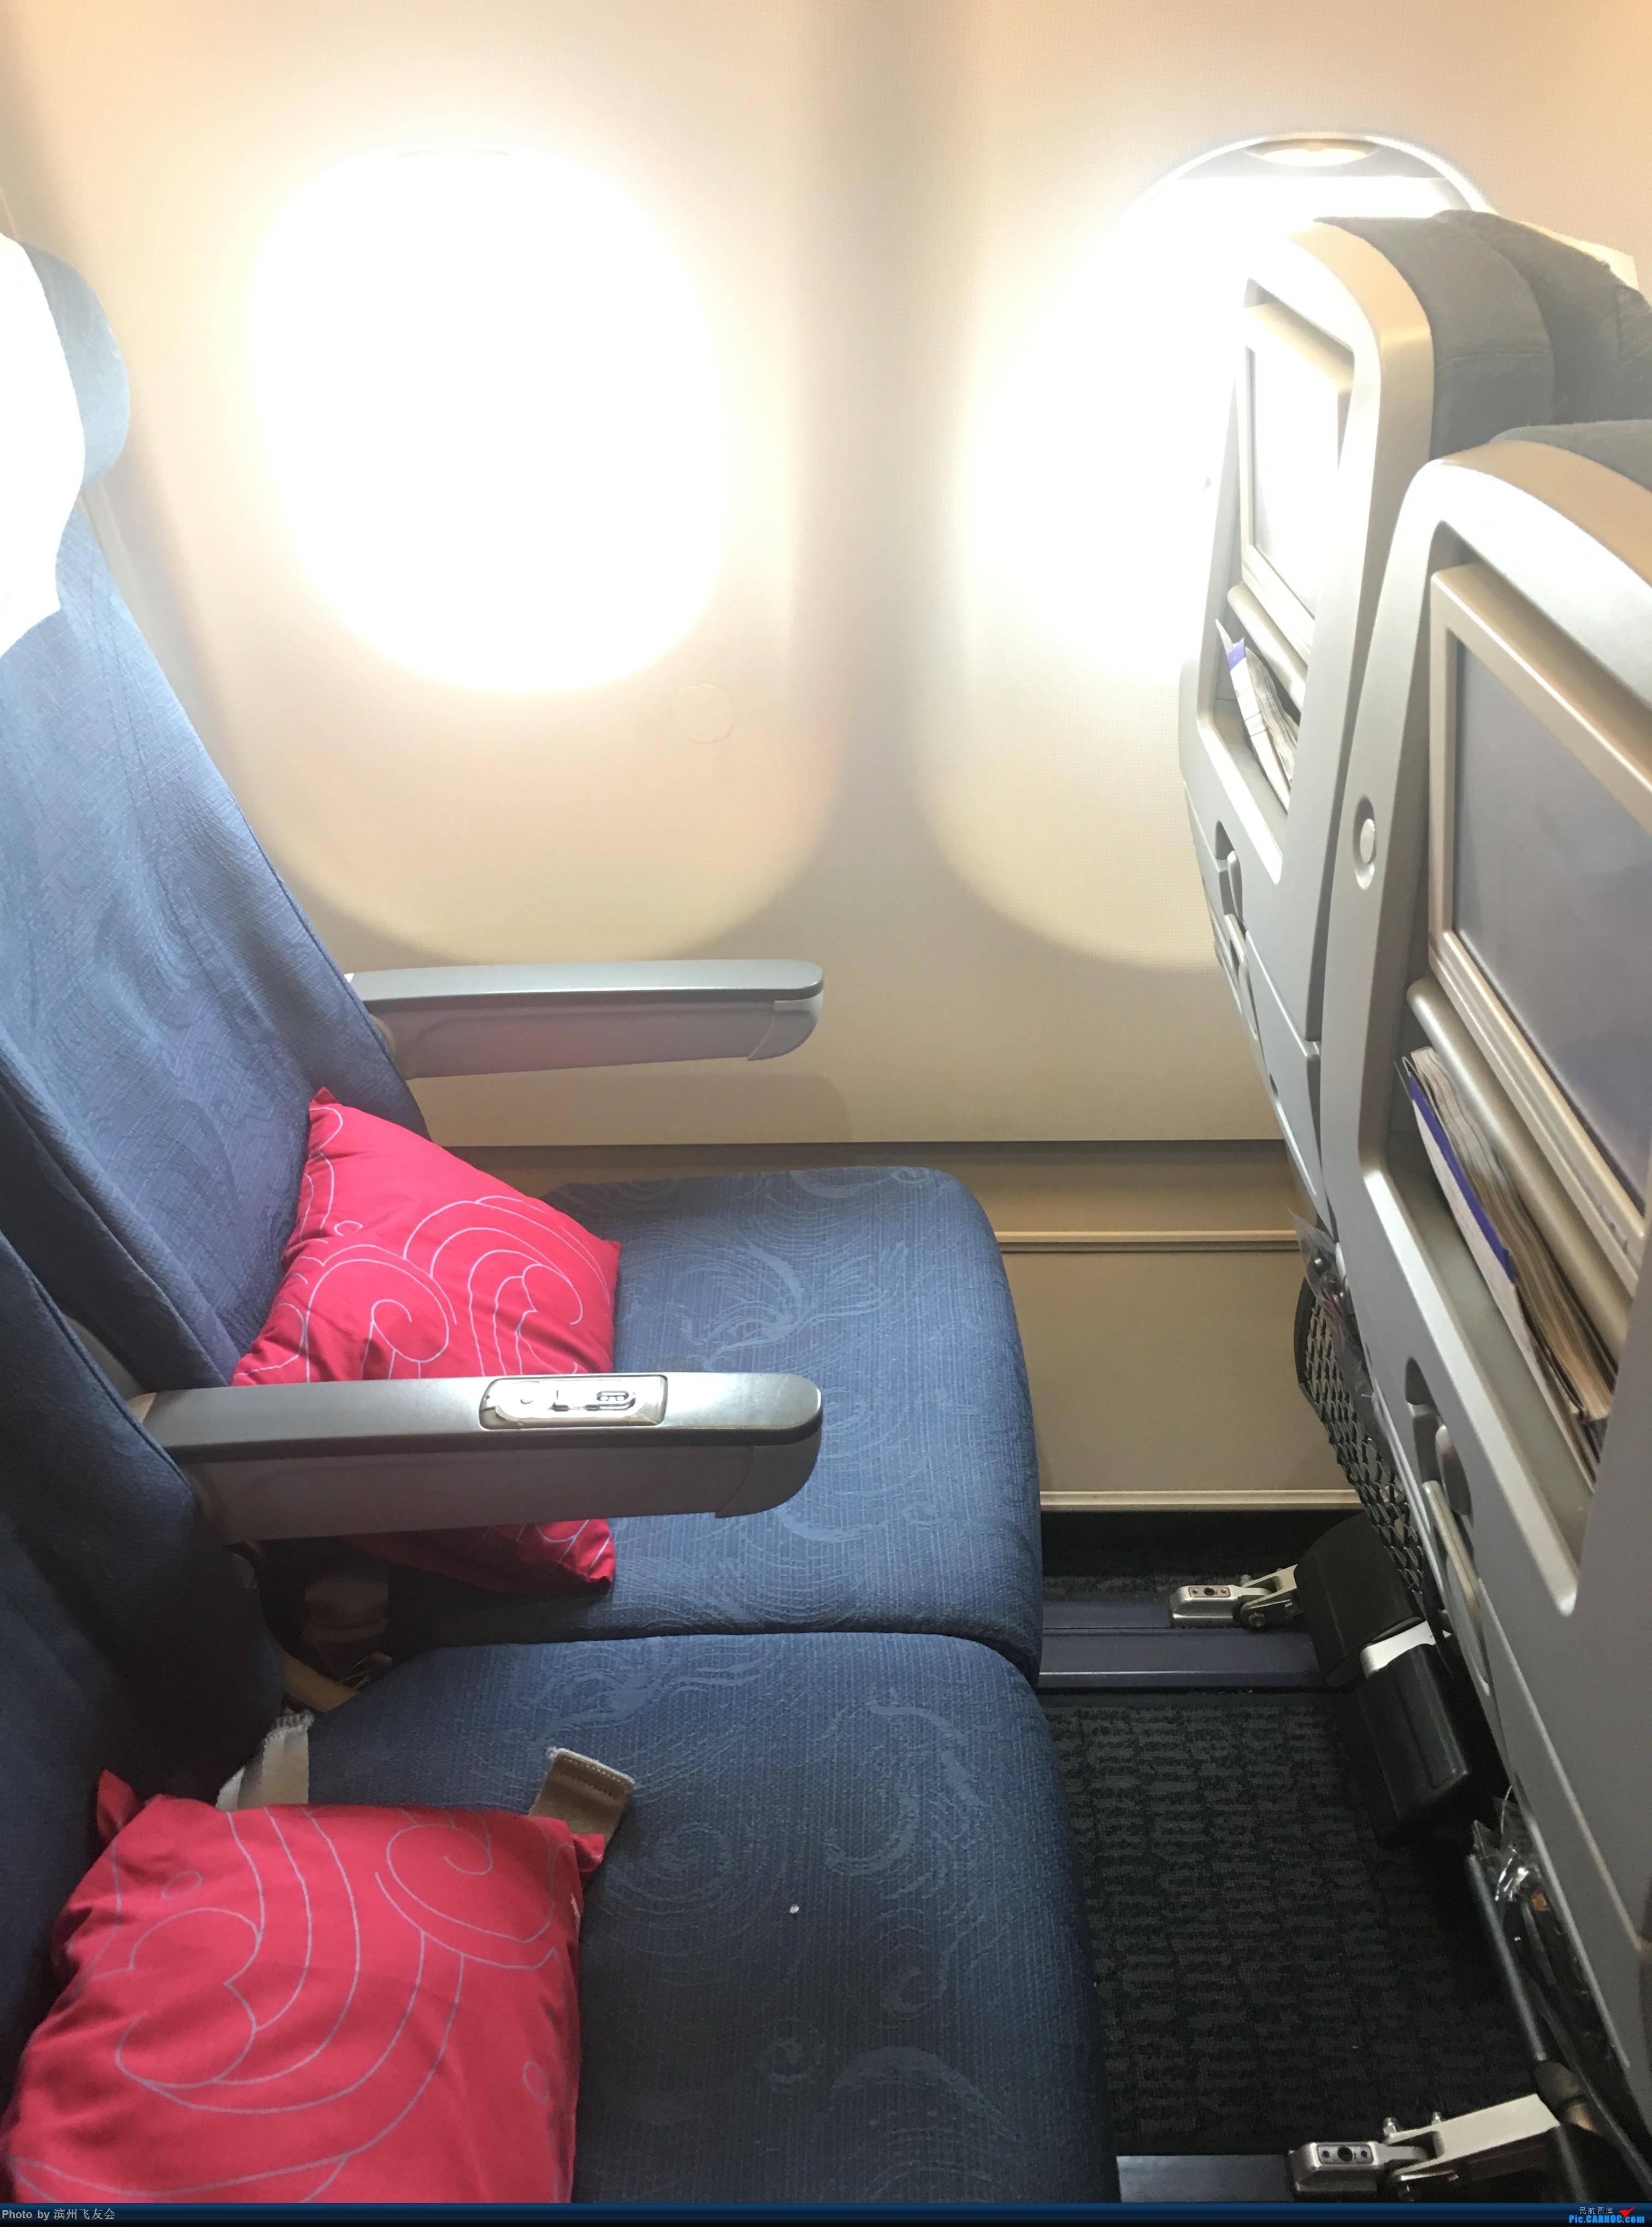 Re:[原创]~骚年飞行篇~补充半年前的香港之路,国航CA111 PEK-HKG,有幸坐到大擦第50架77W